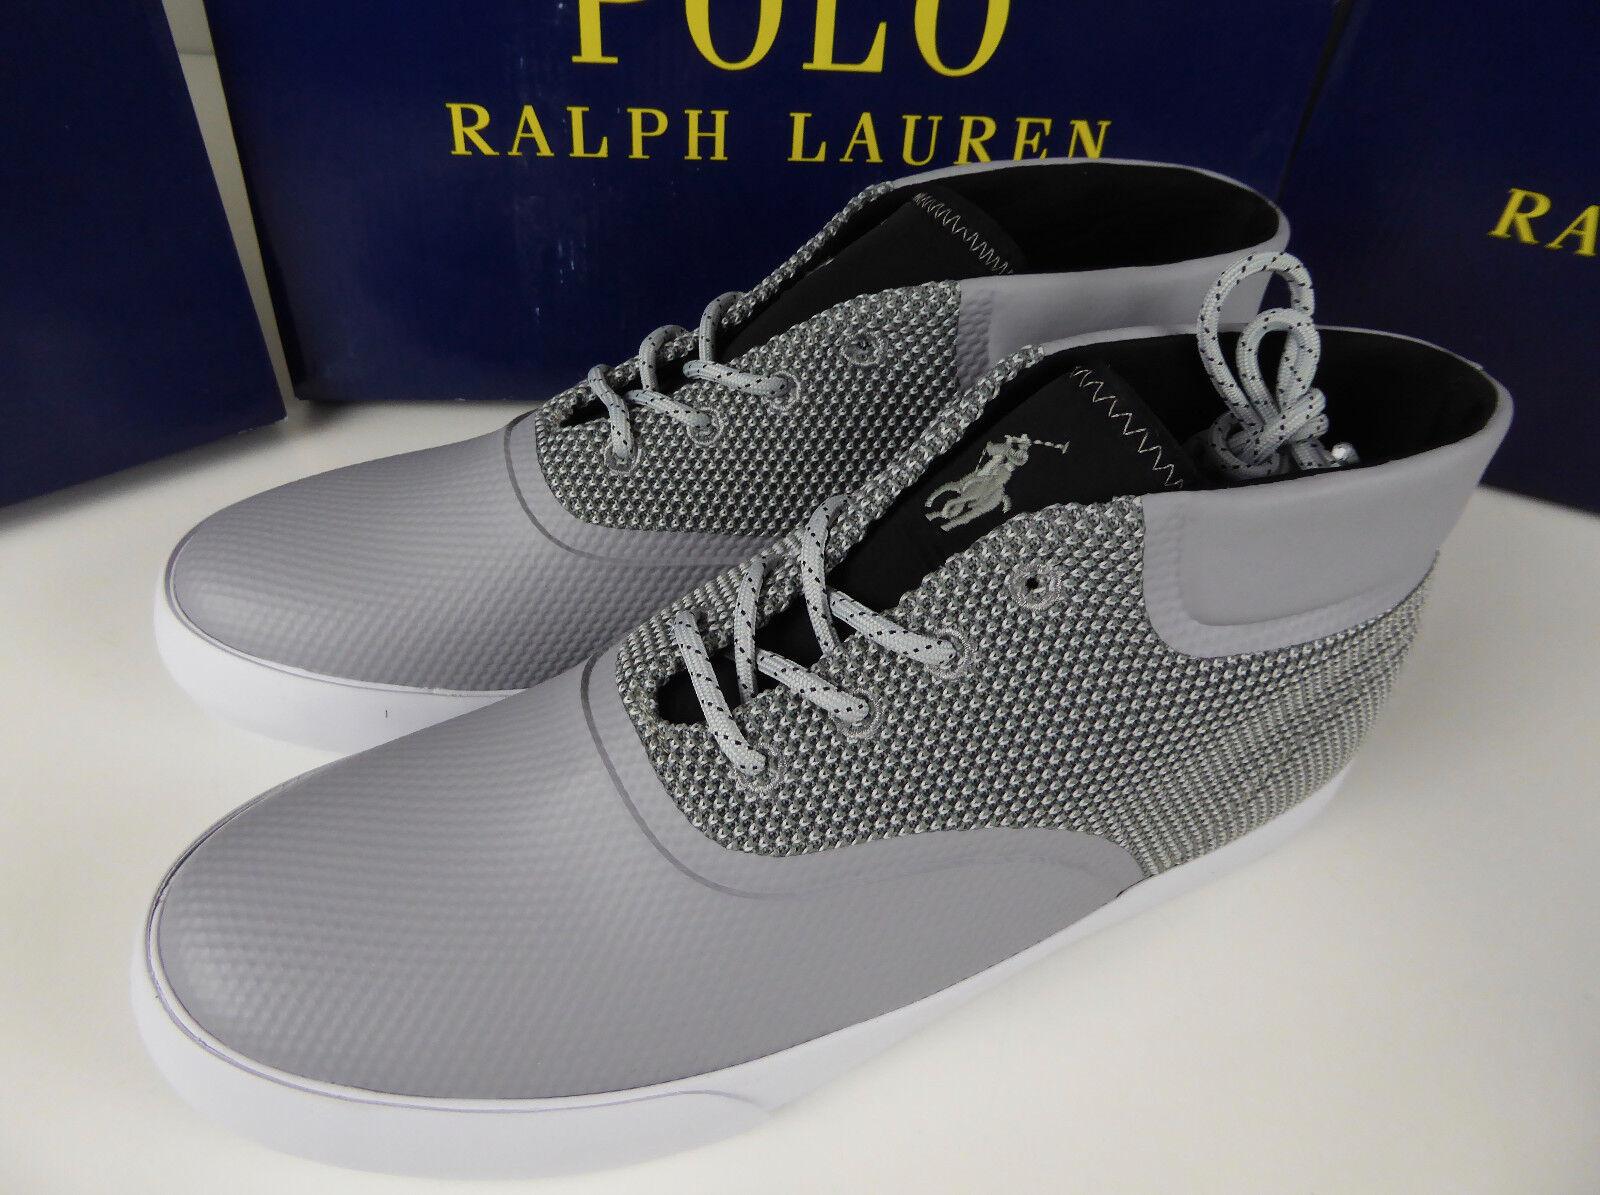 Polo Ralph Lauren Vadik Vadik Lauren Mesh Sneaker Chukka Shoes NIB New Vulcanized w Pony Logo 62c4ad